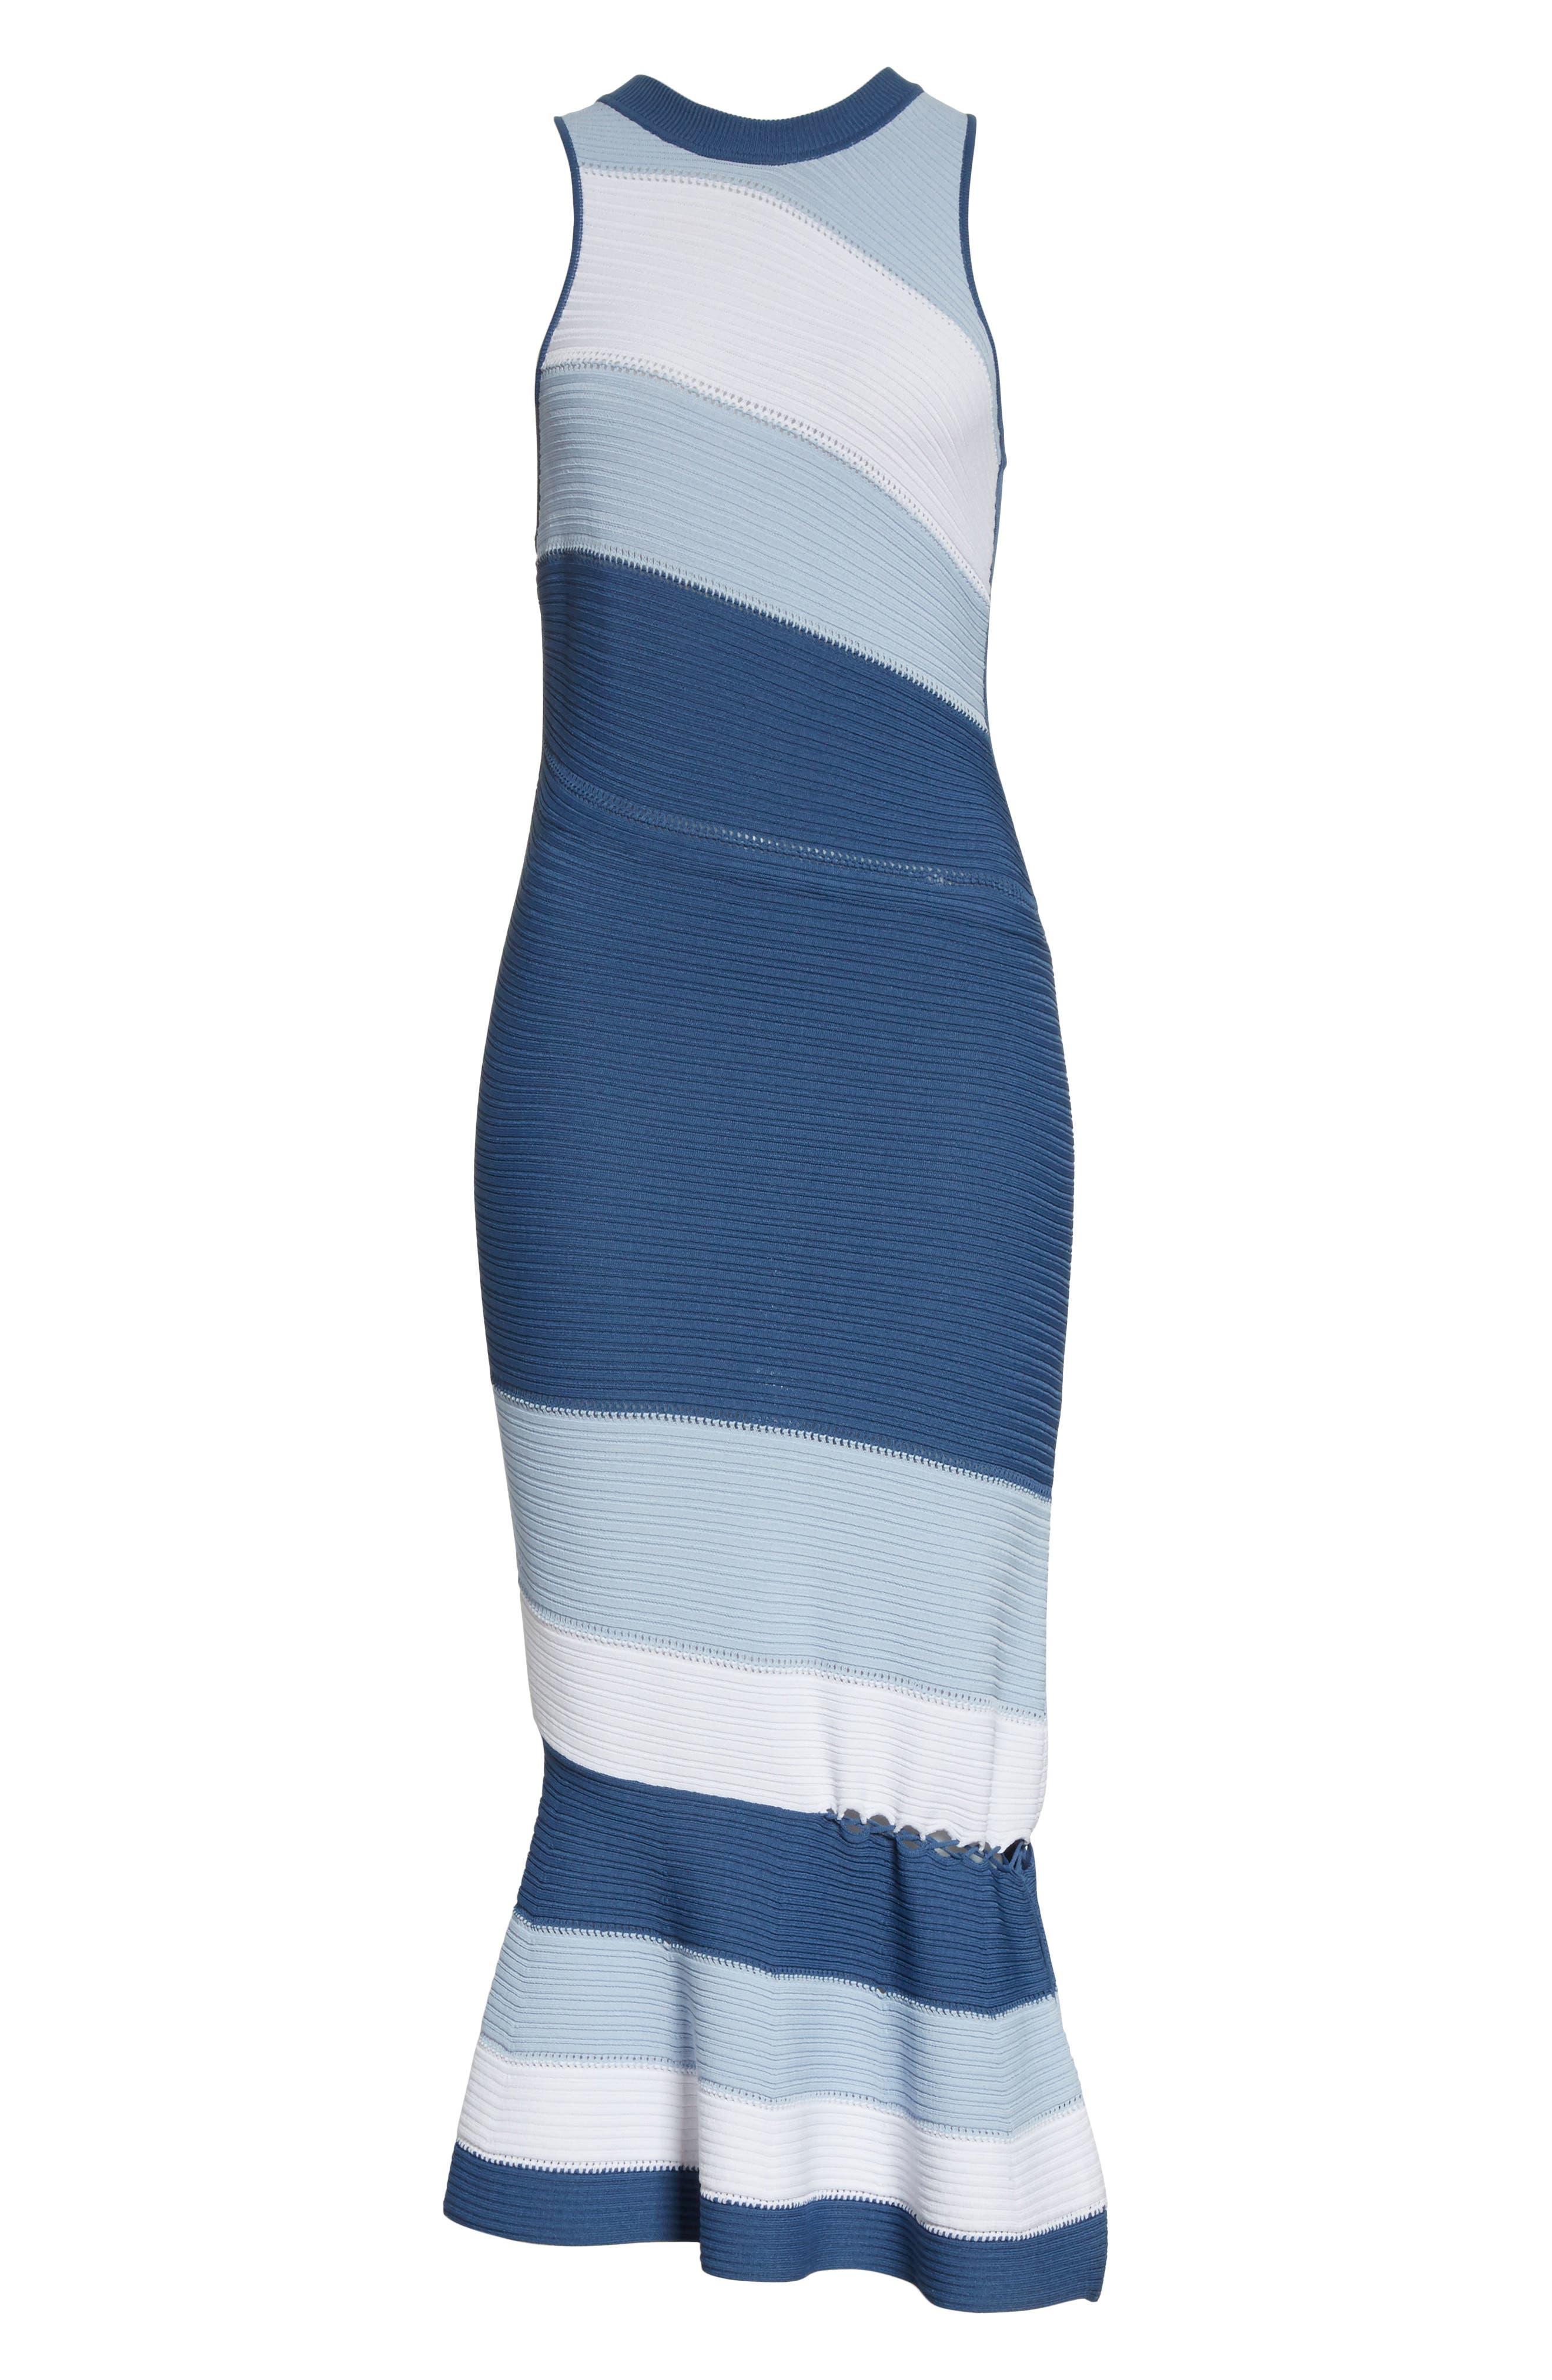 Linked Asymmetrical Dress,                             Alternate thumbnail 6, color,                             478